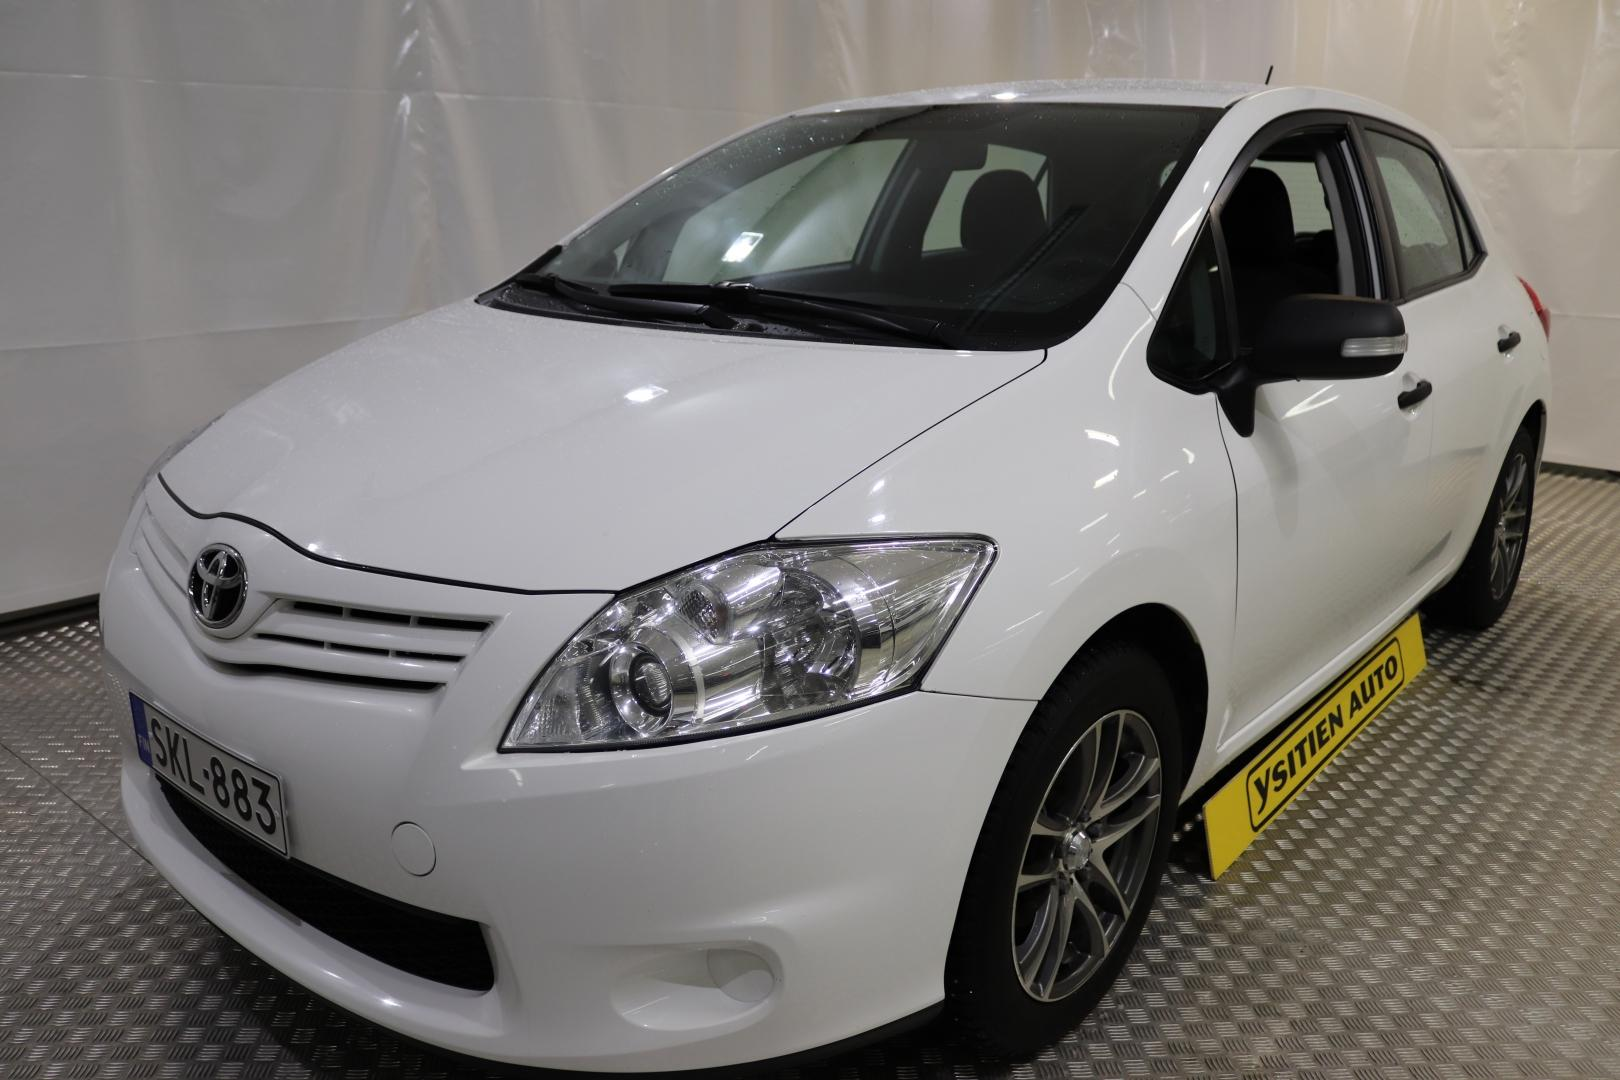 Toyota Auris, 1,6 Valvematic Linea Terra 5ov